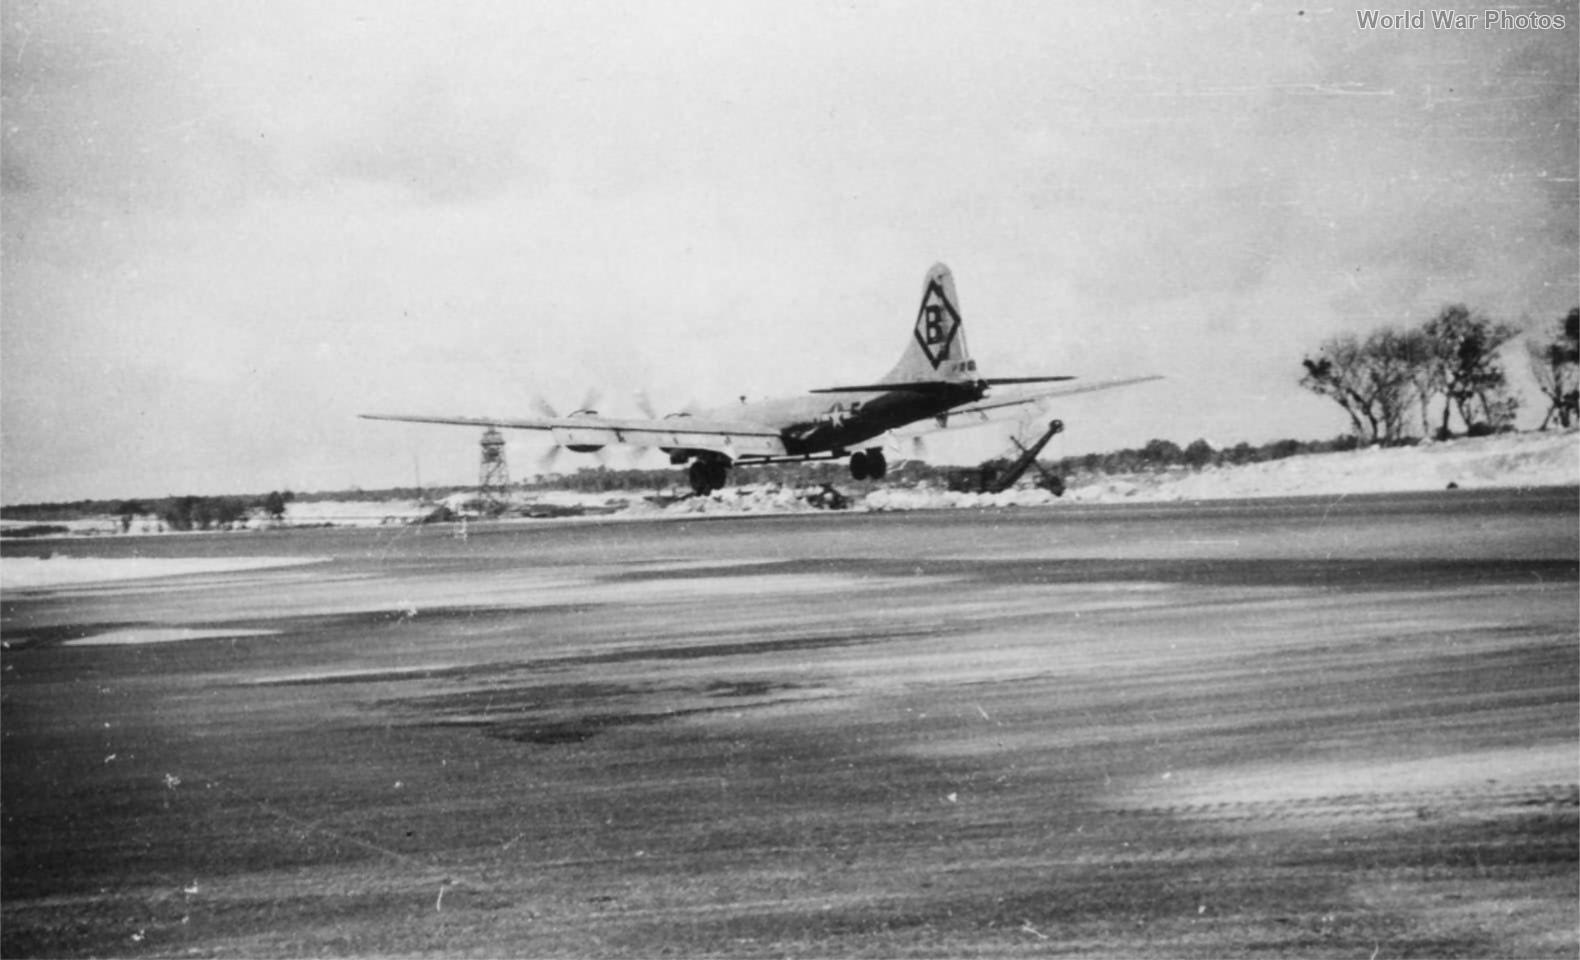 B-29 of the 16th BG